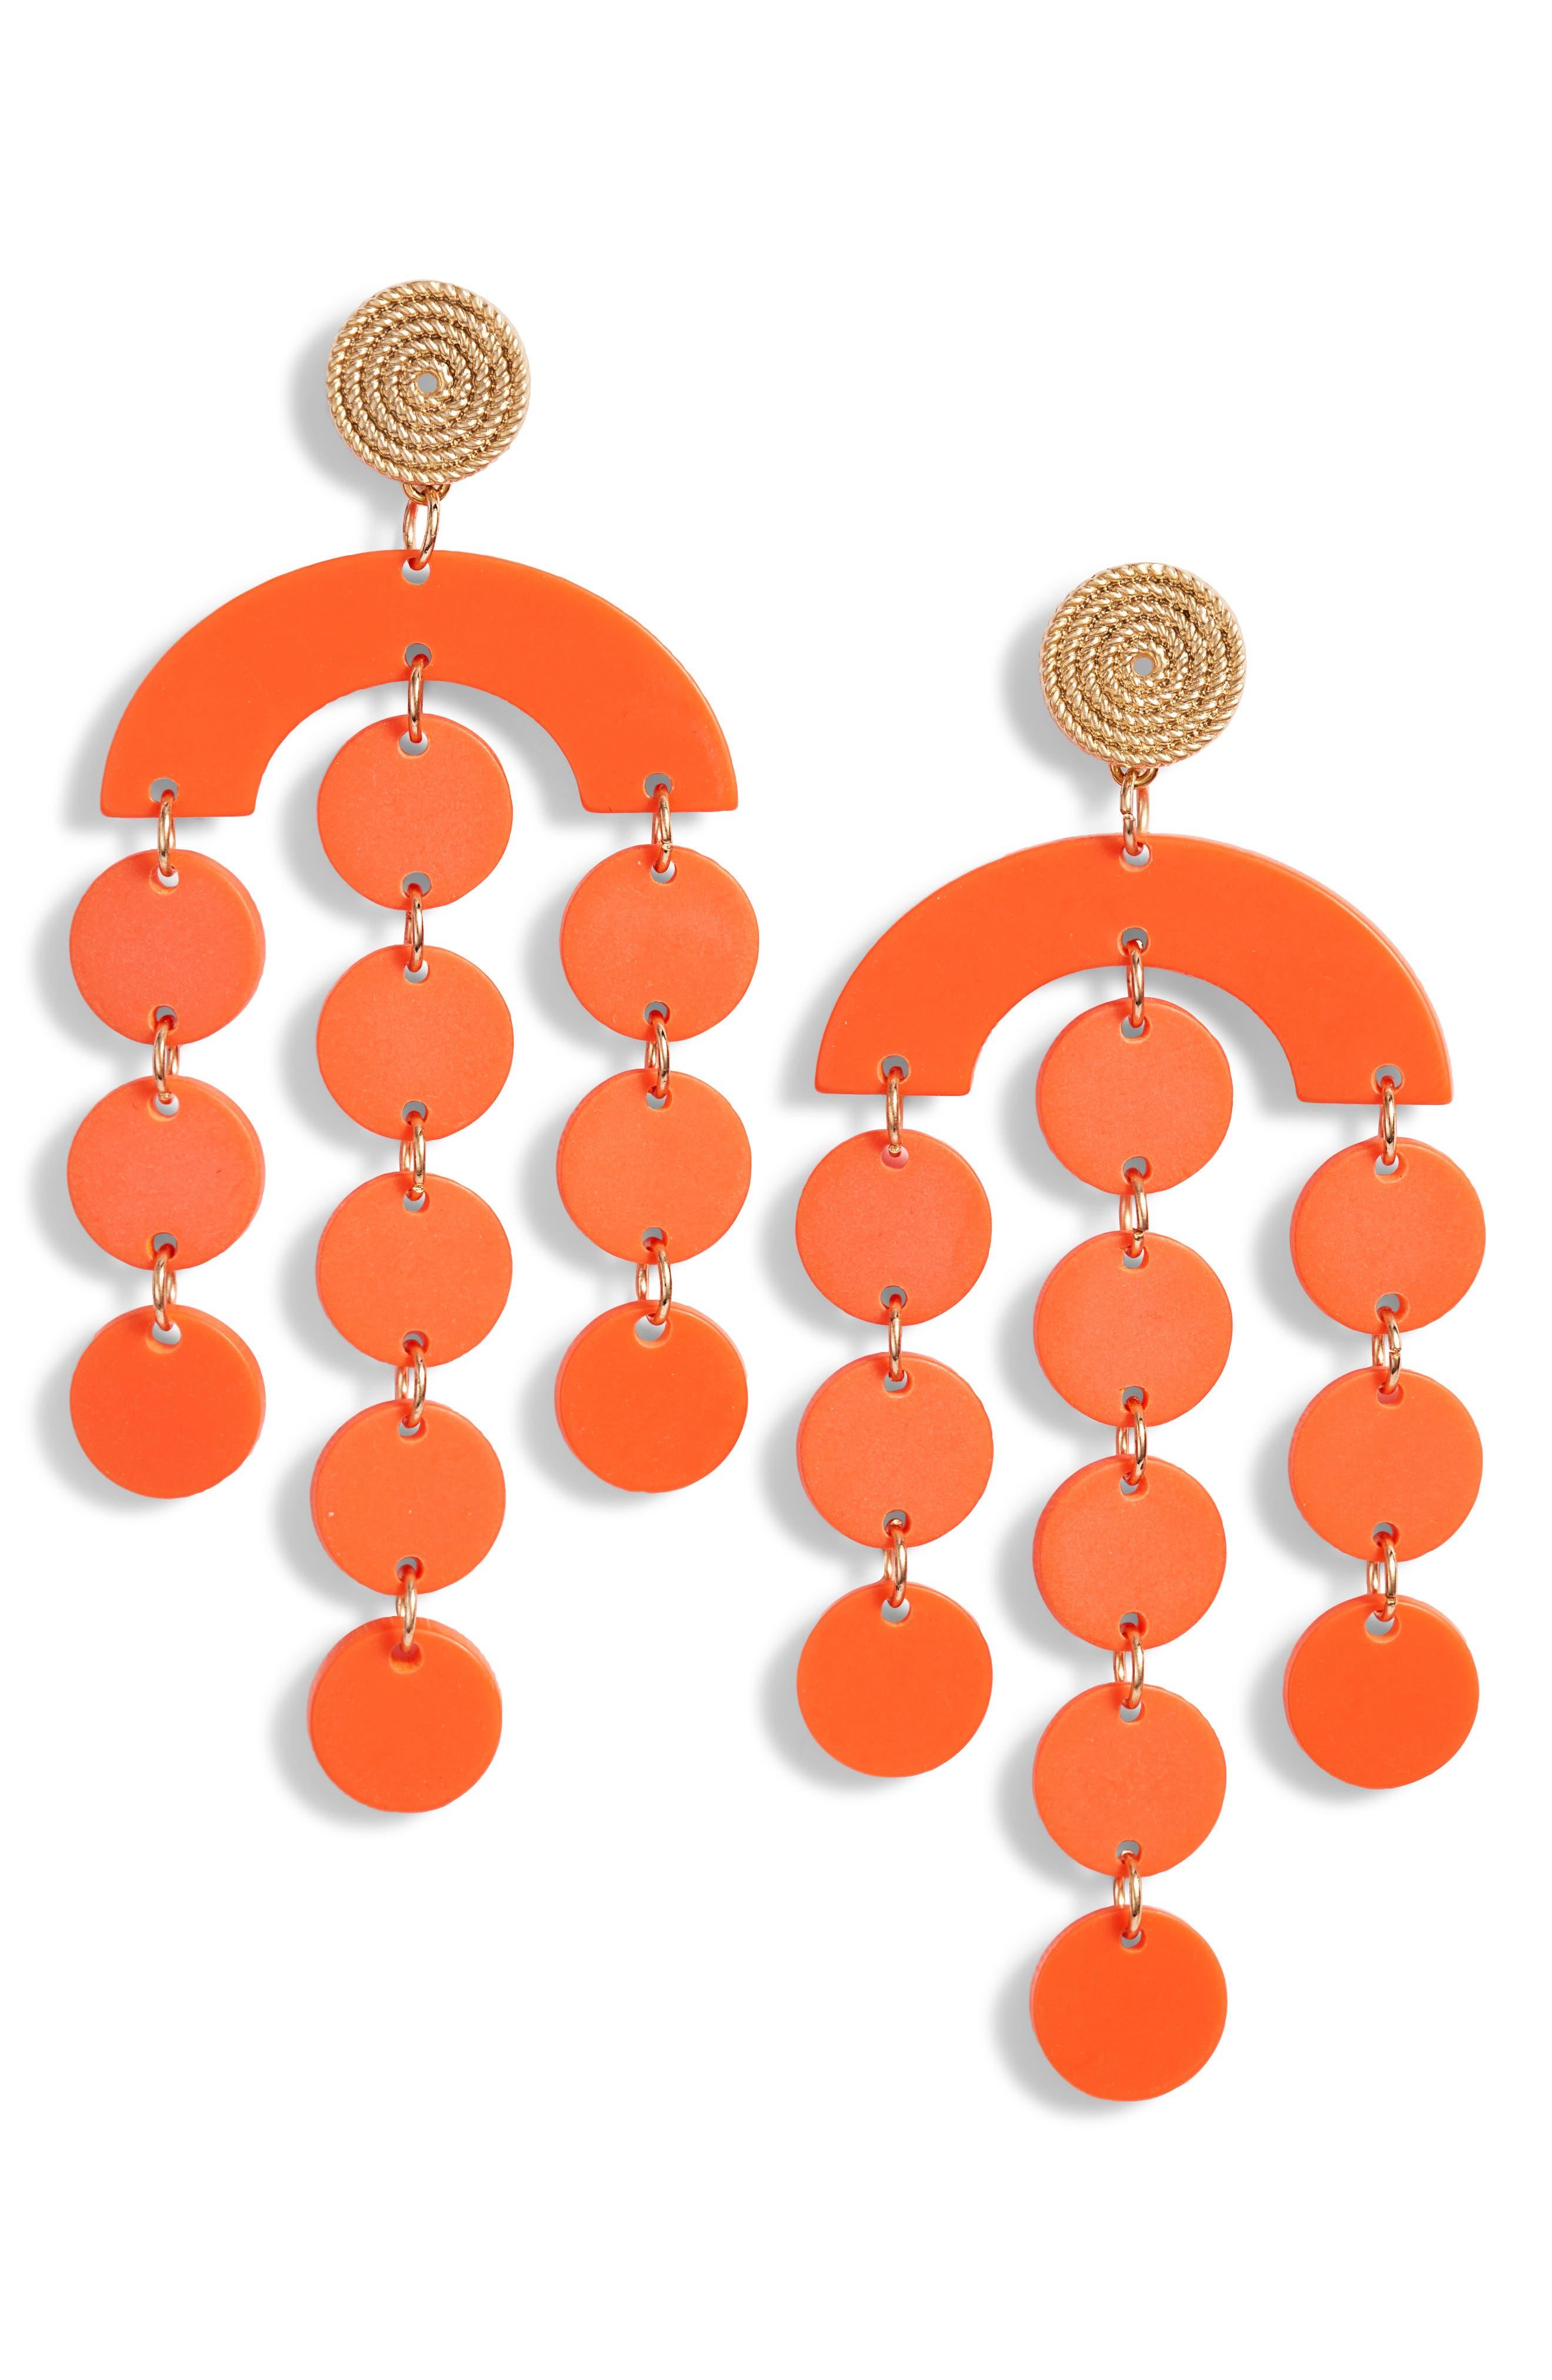 60s -70s Jewelry – Necklaces, Earrings, Rings, Bracelets Womens Bracha Santa Barbara Earrings $40.00 AT vintagedancer.com